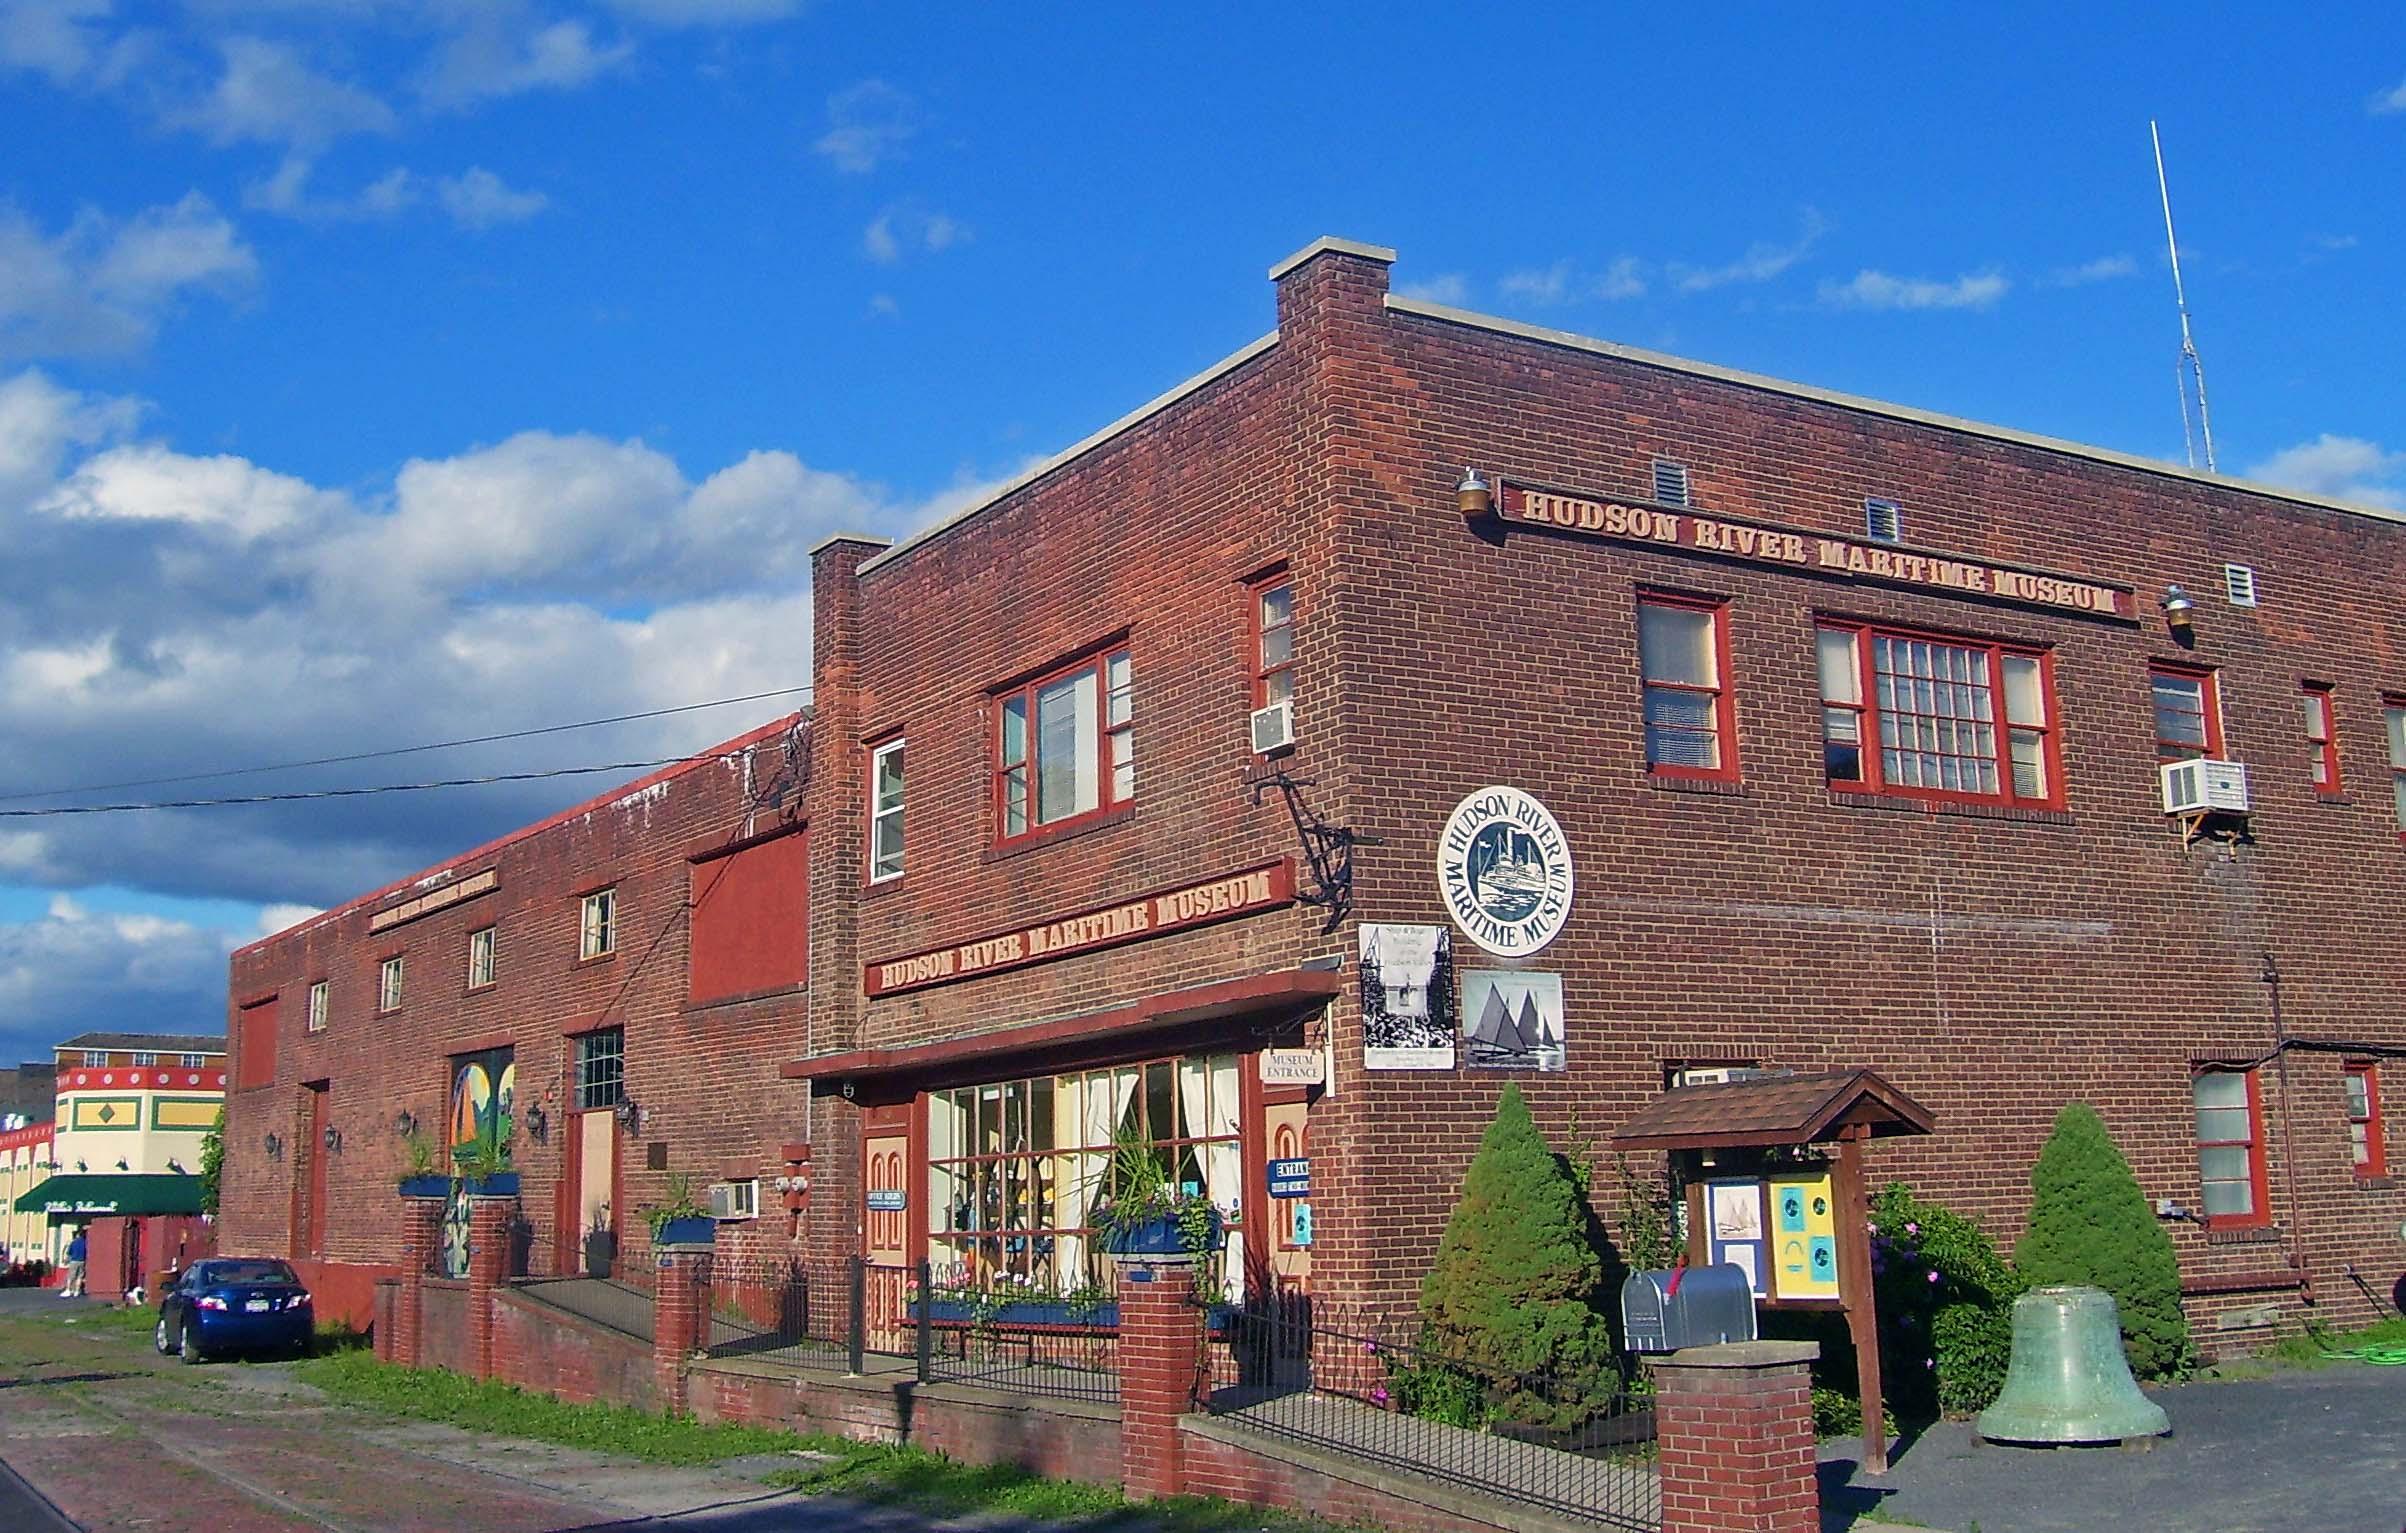 The Hudson River Maritime Museum